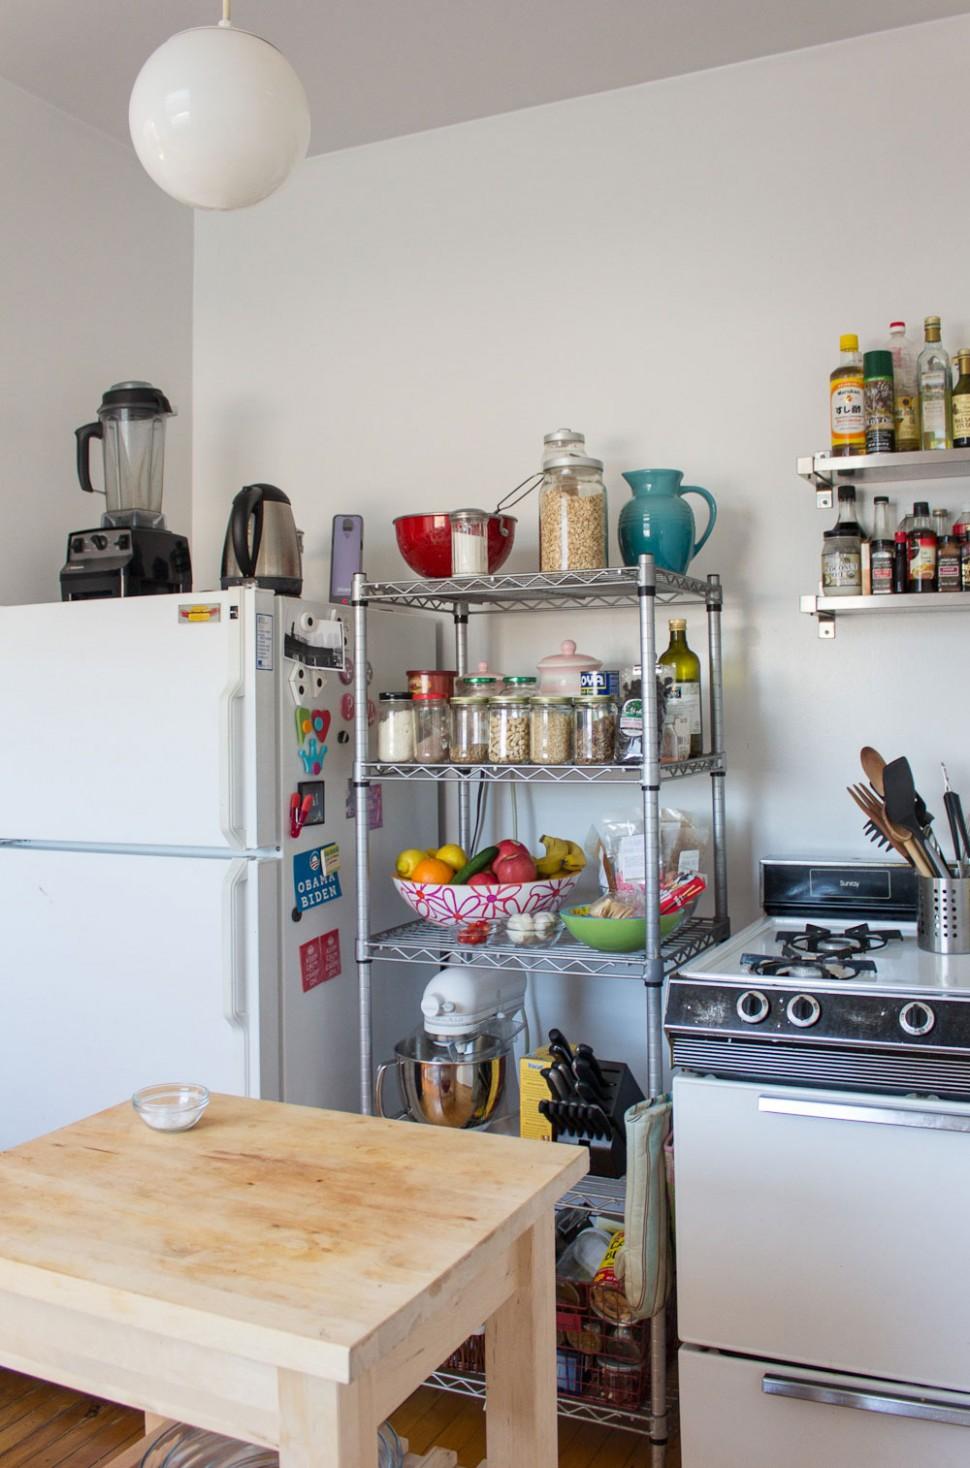 10+ Best Small Kitchen Design Ideas - Decorating Tiny Apartment  - Apartment Kitchen Design